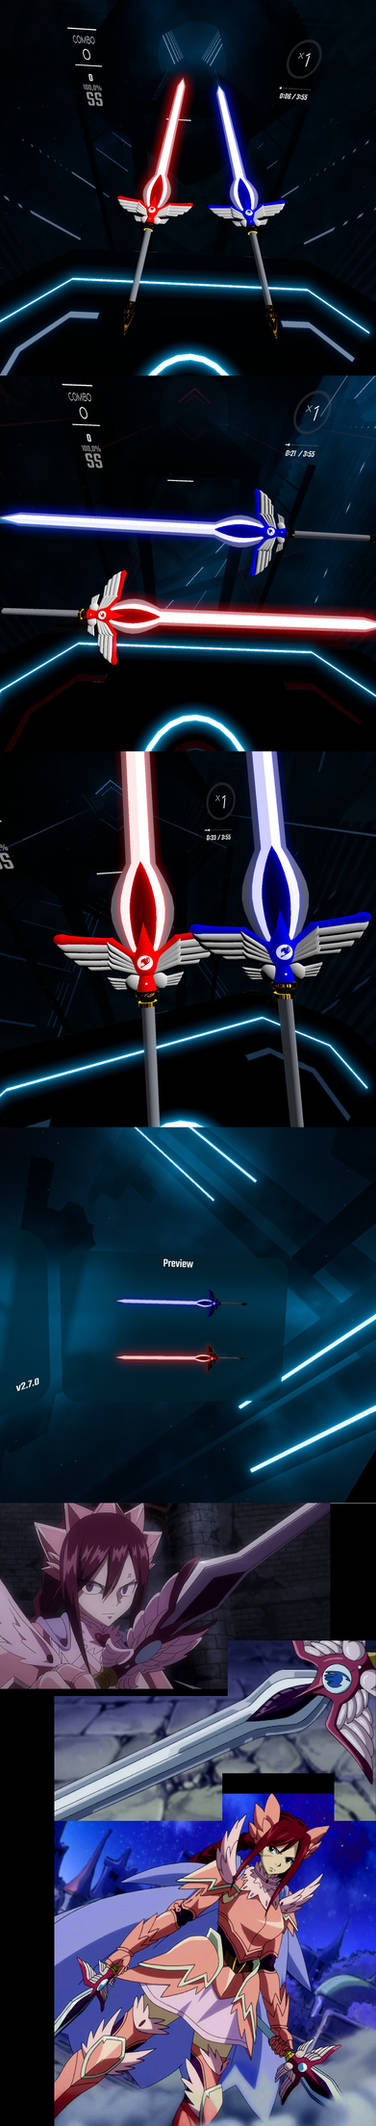 Erza Scarlet - Armadura Fair Swords for Beat Saber by Melllin